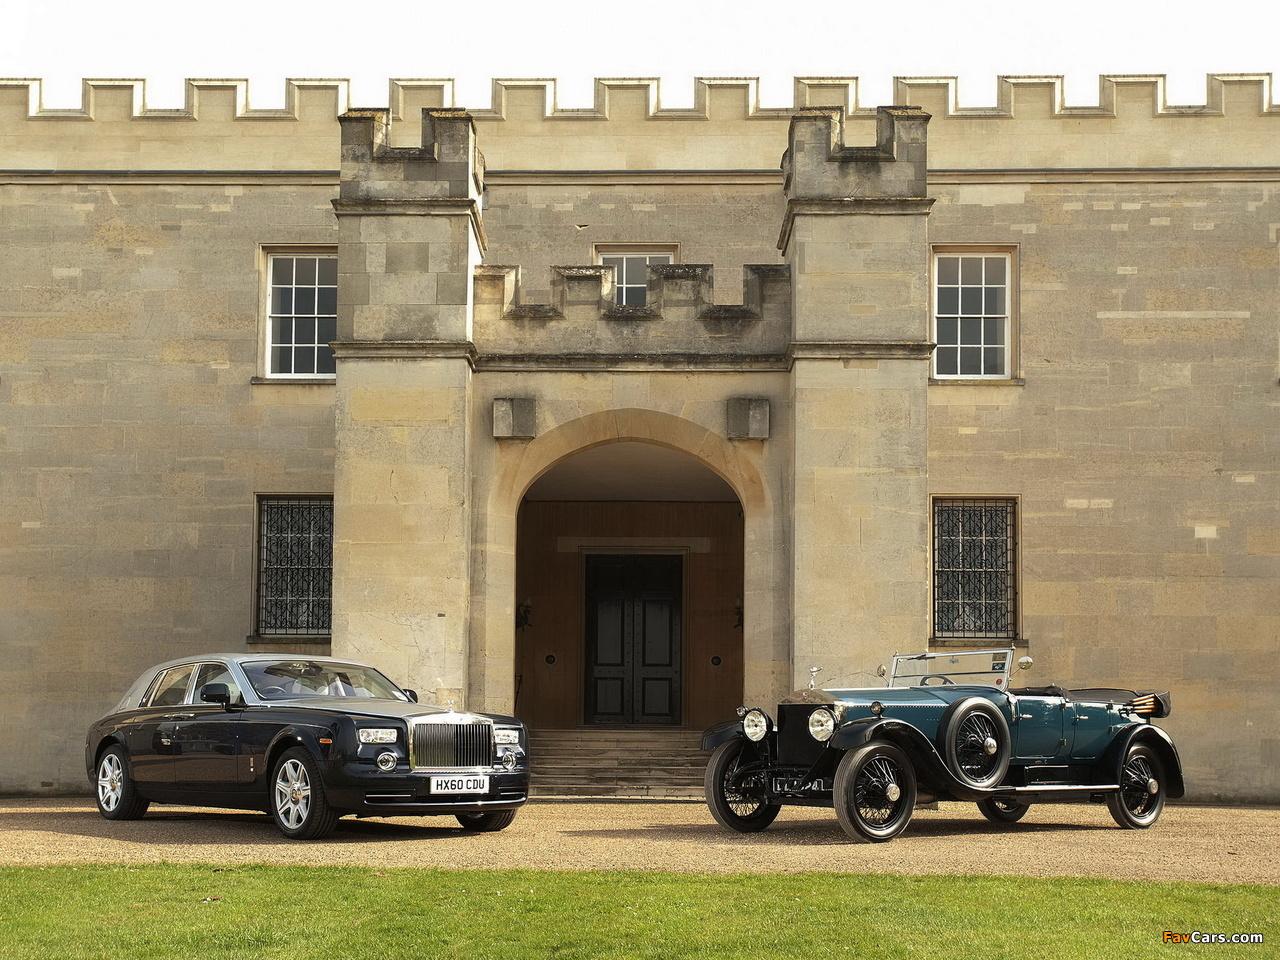 Rolls-Royce wallpapers (1280 x 960)